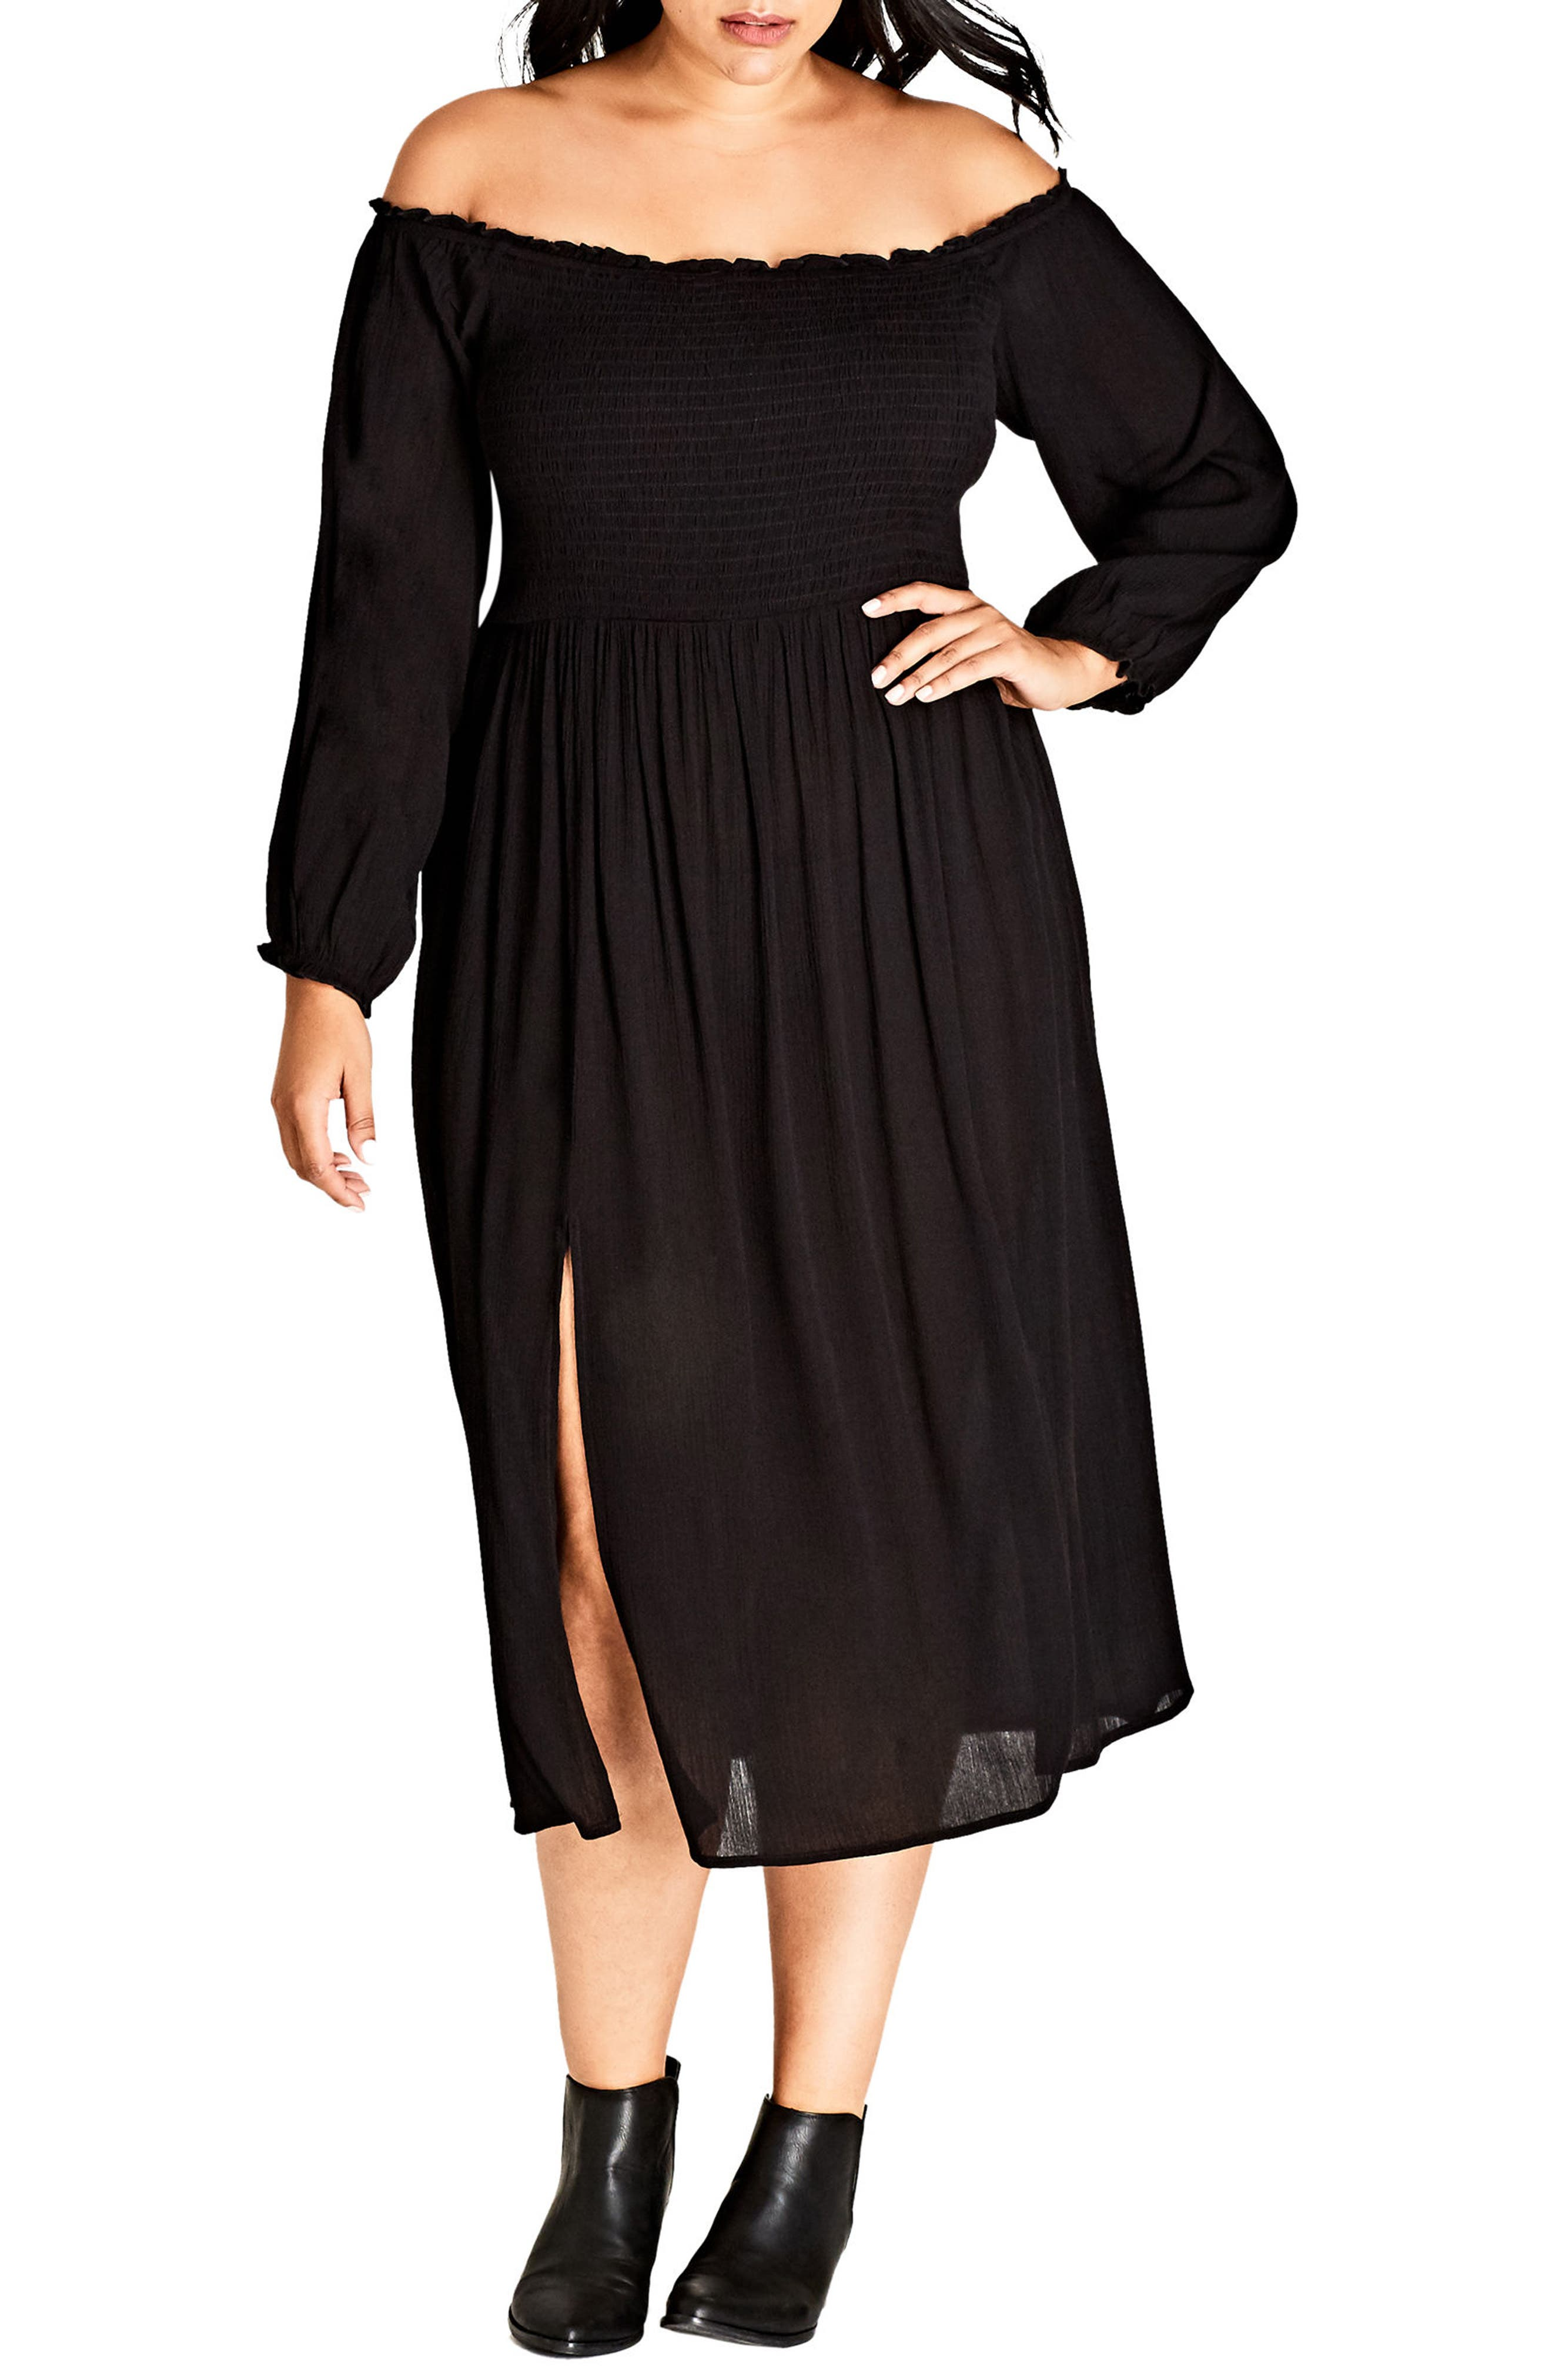 Main Image - City Chic Vintage Midi Dress (Plus Size)